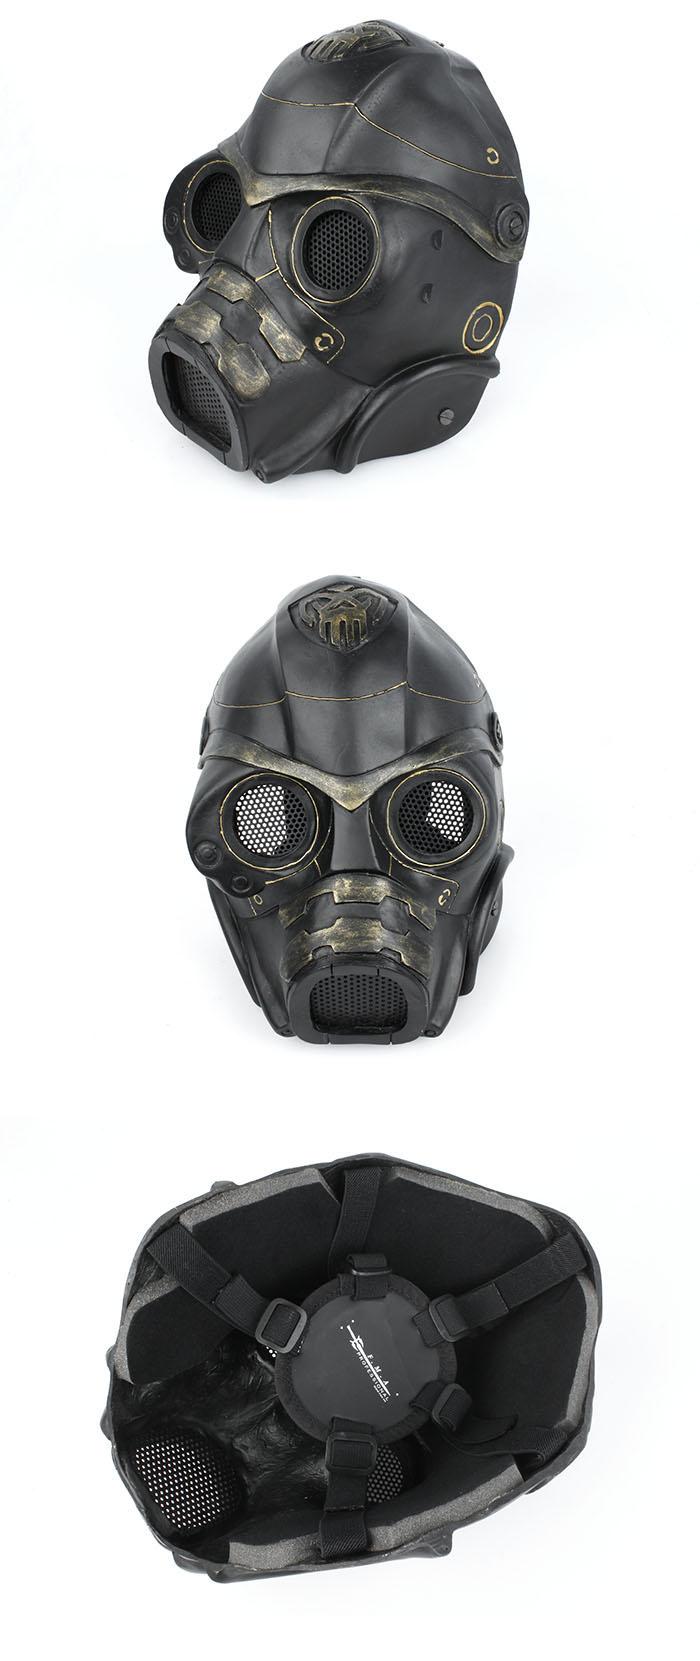 masque de protection  Fma20w10